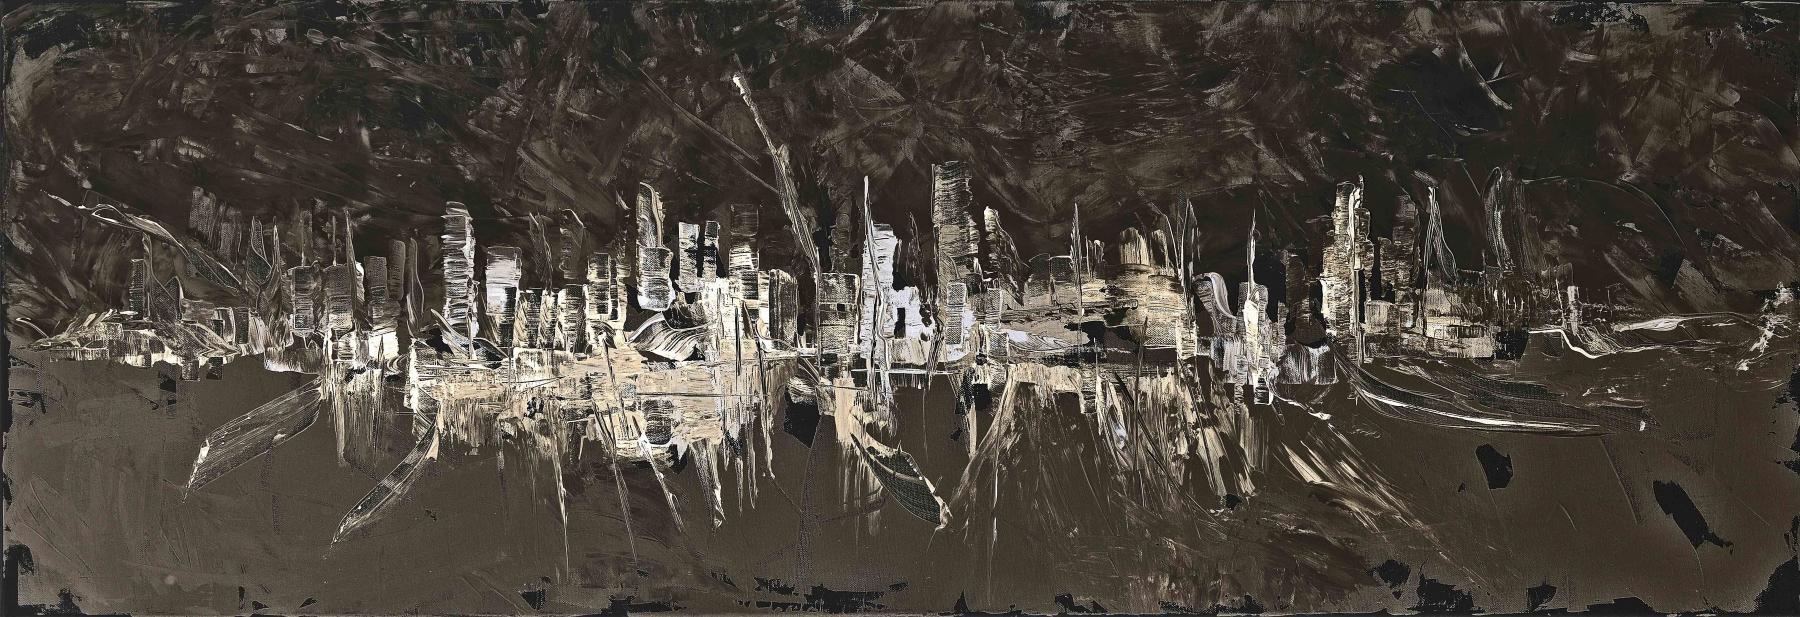 Ella-Gengel-SdZ3-New-York-IV-2-2019-Gimp-Farbwert-drehen-fürs-Web